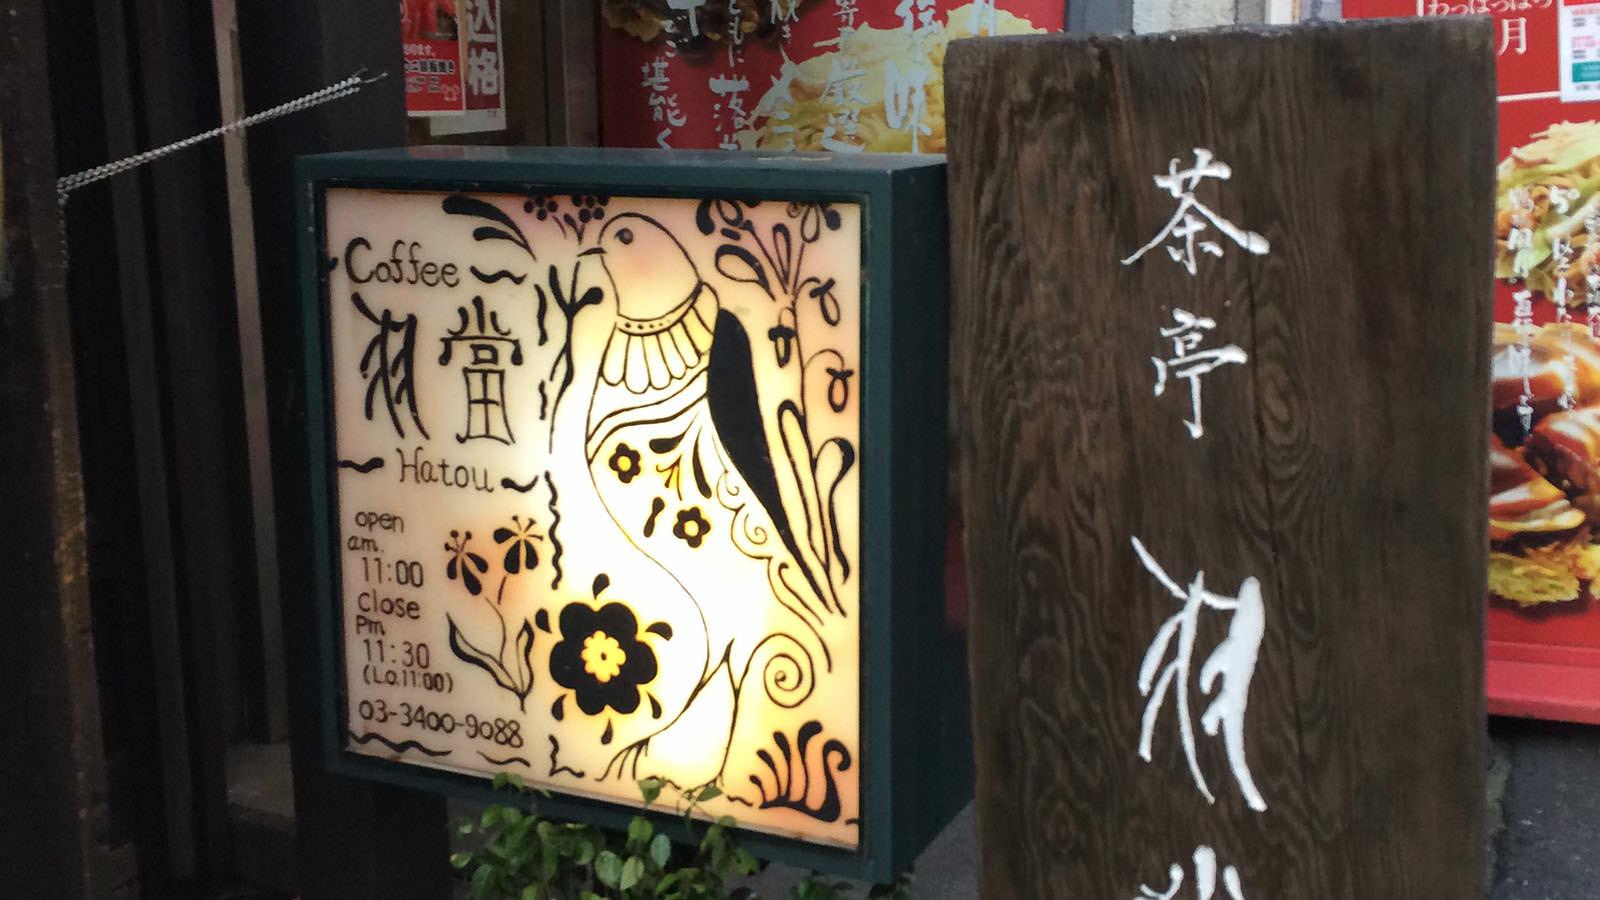 茶亭 羽當 渋谷 喫茶店 コーヒー